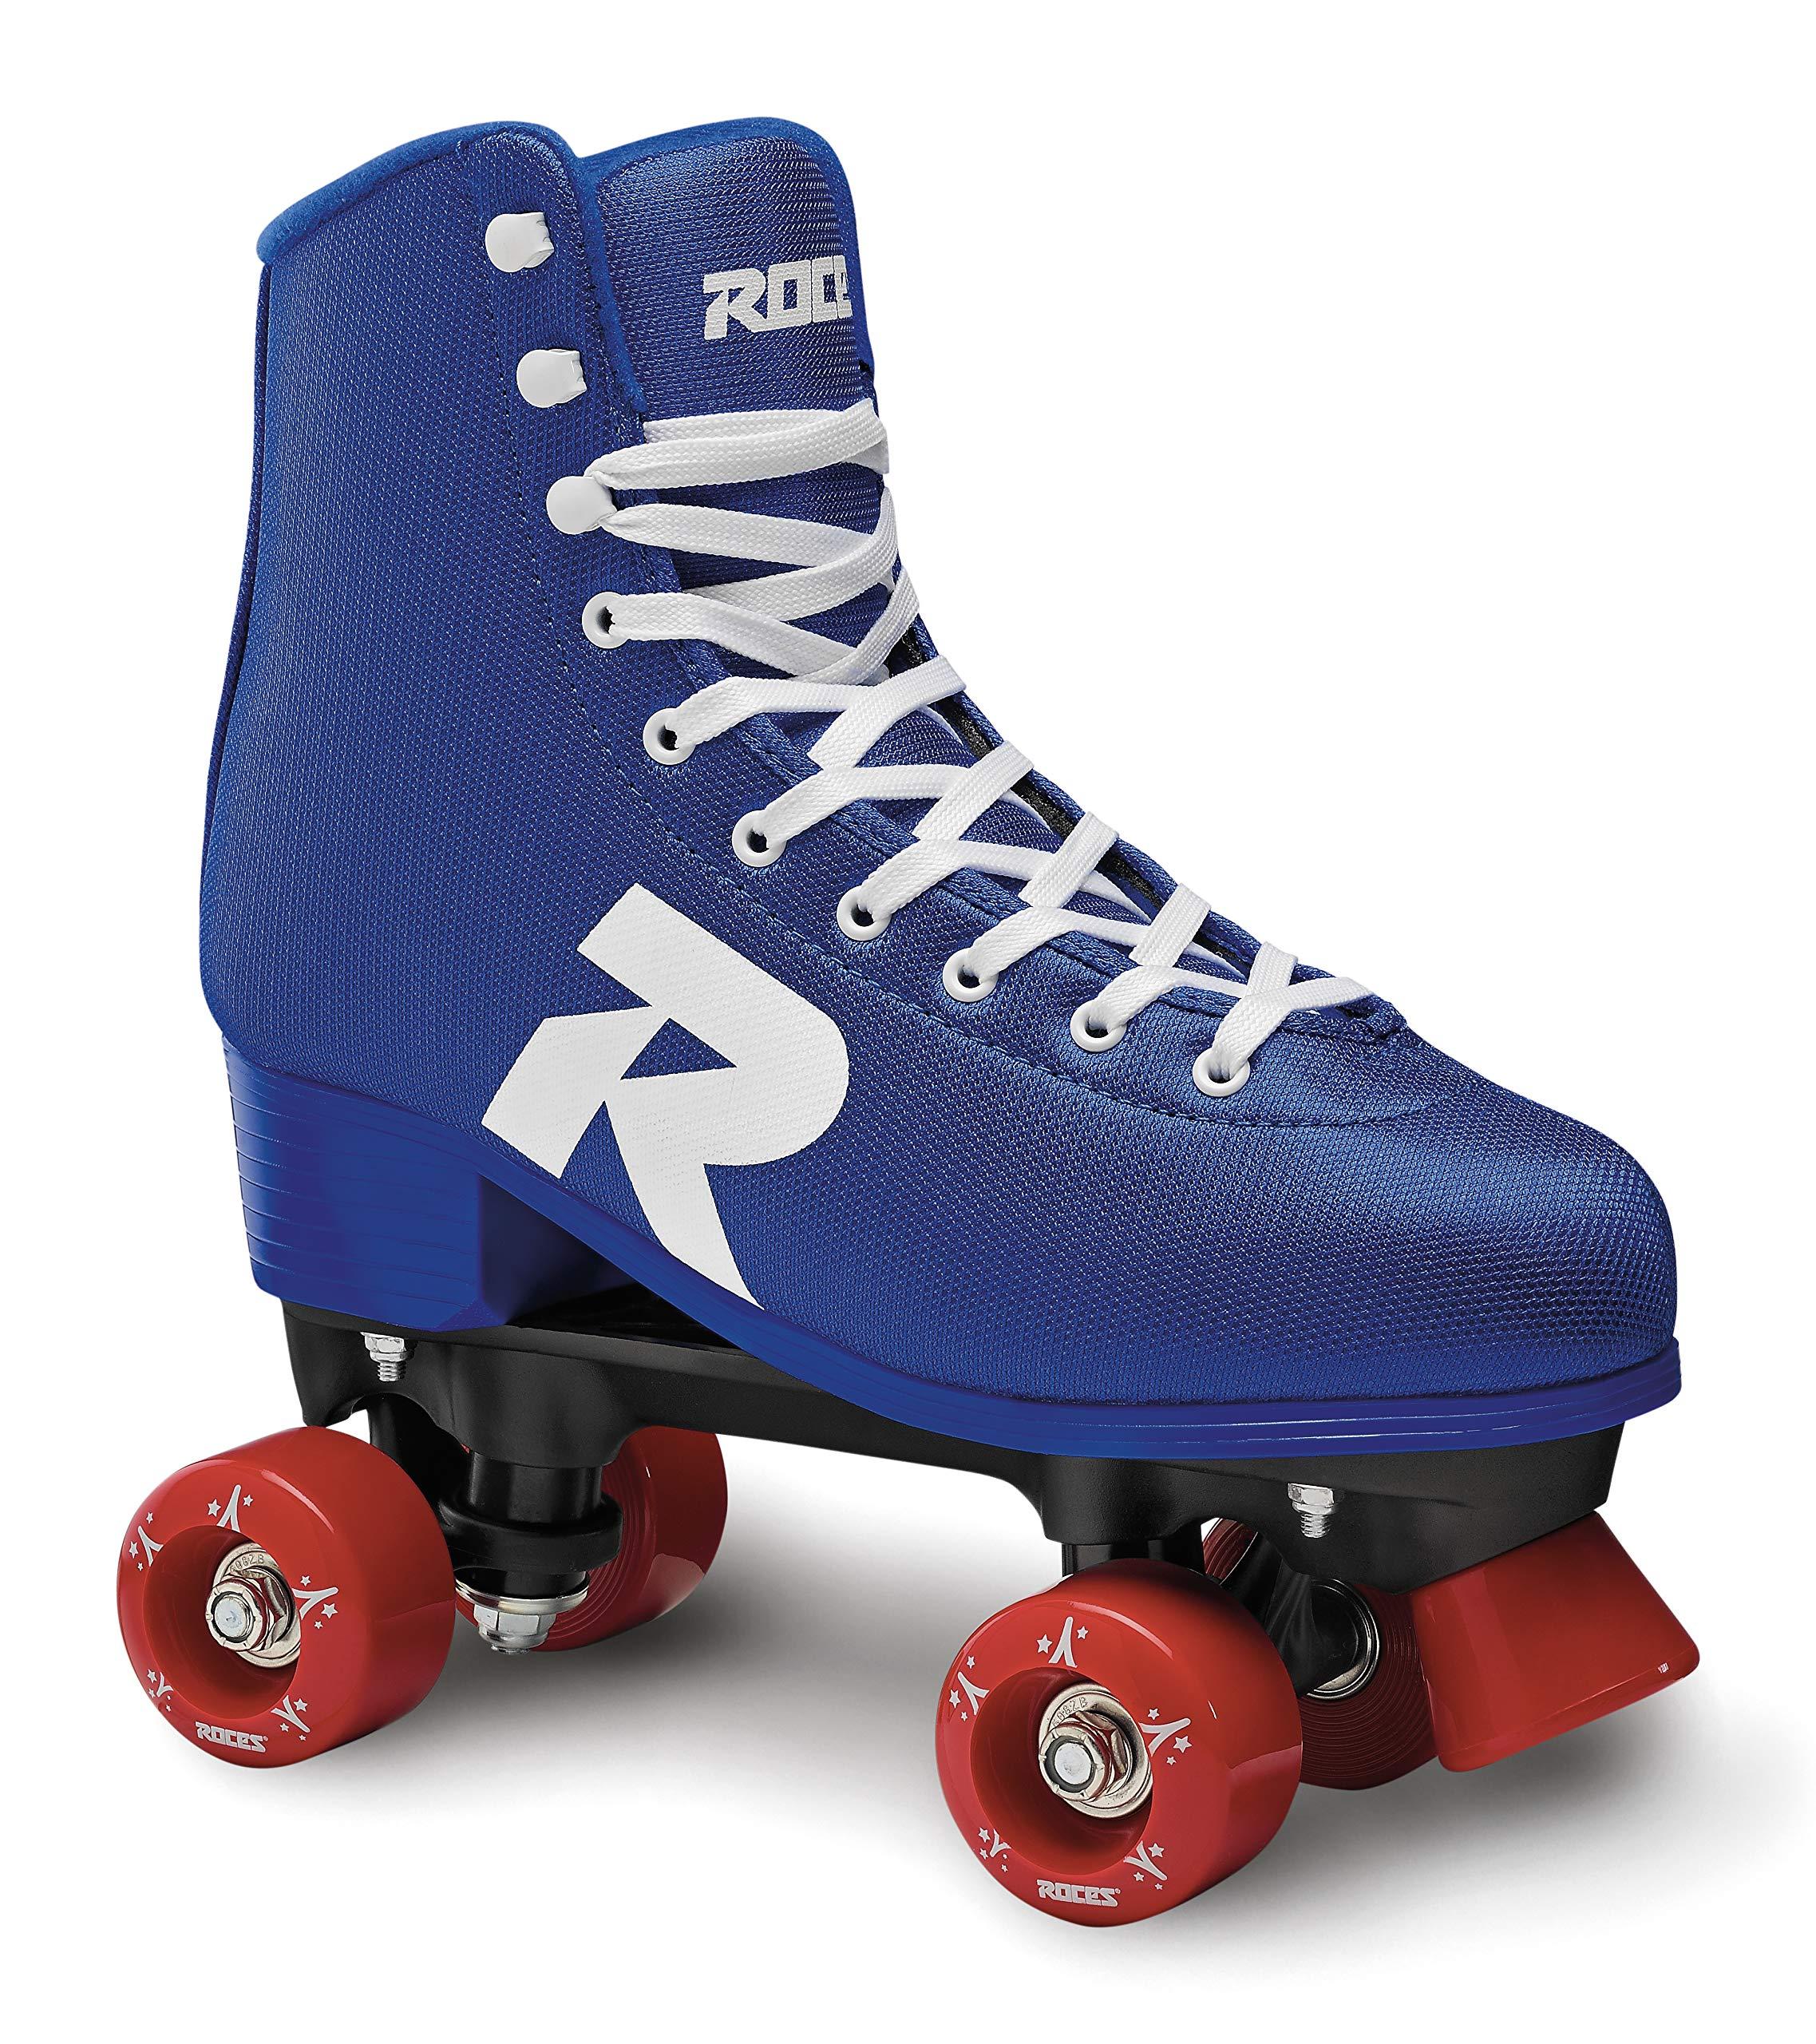 Roces 550062 Model 52 Star Roller Skate, US 6M/8W, Blue/White